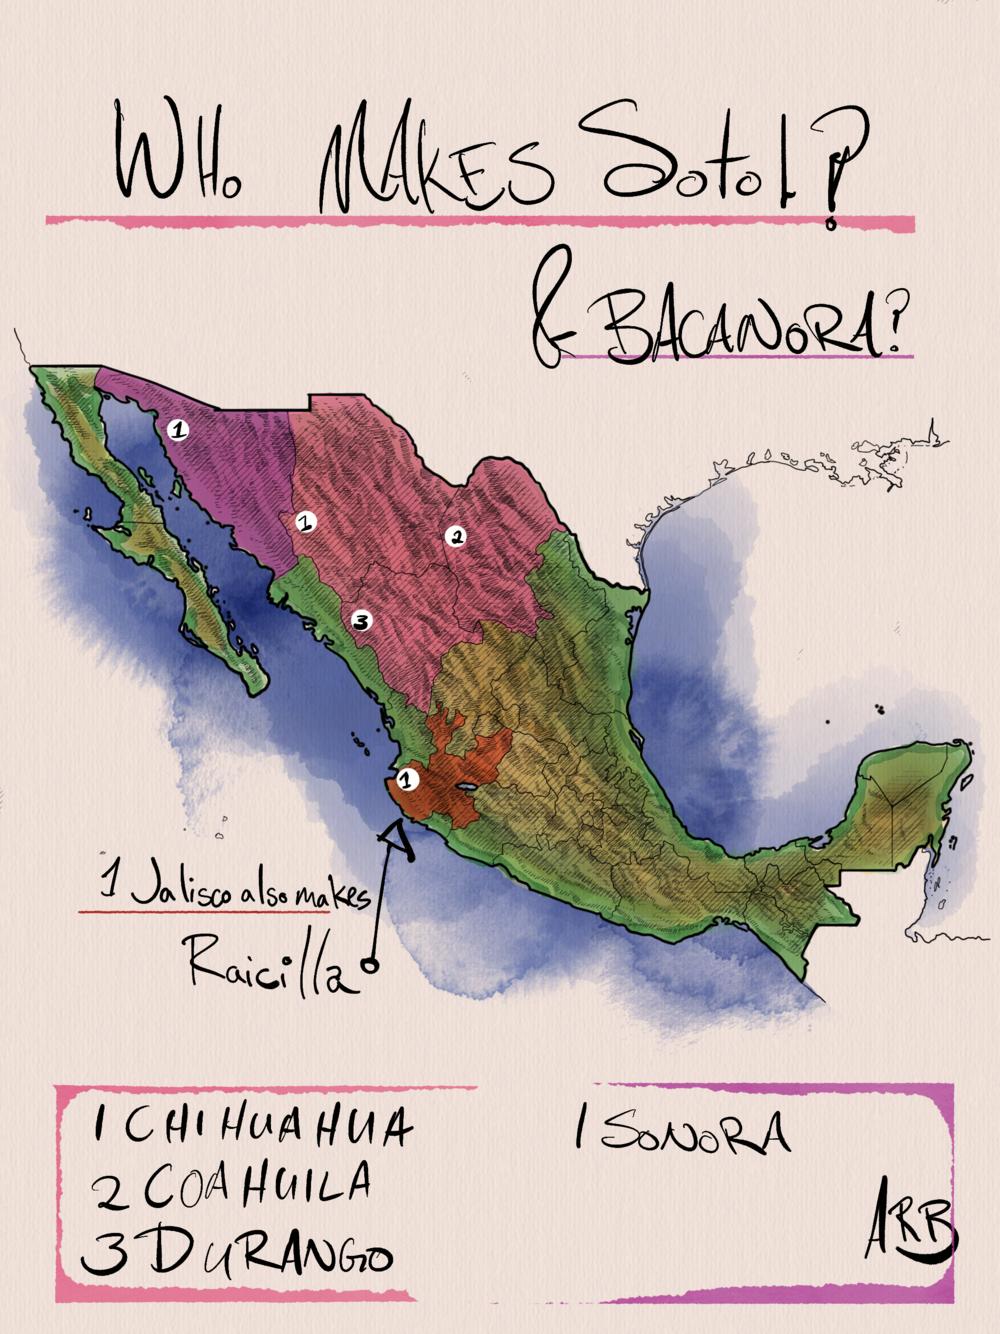 Raicilla is from Jalisco